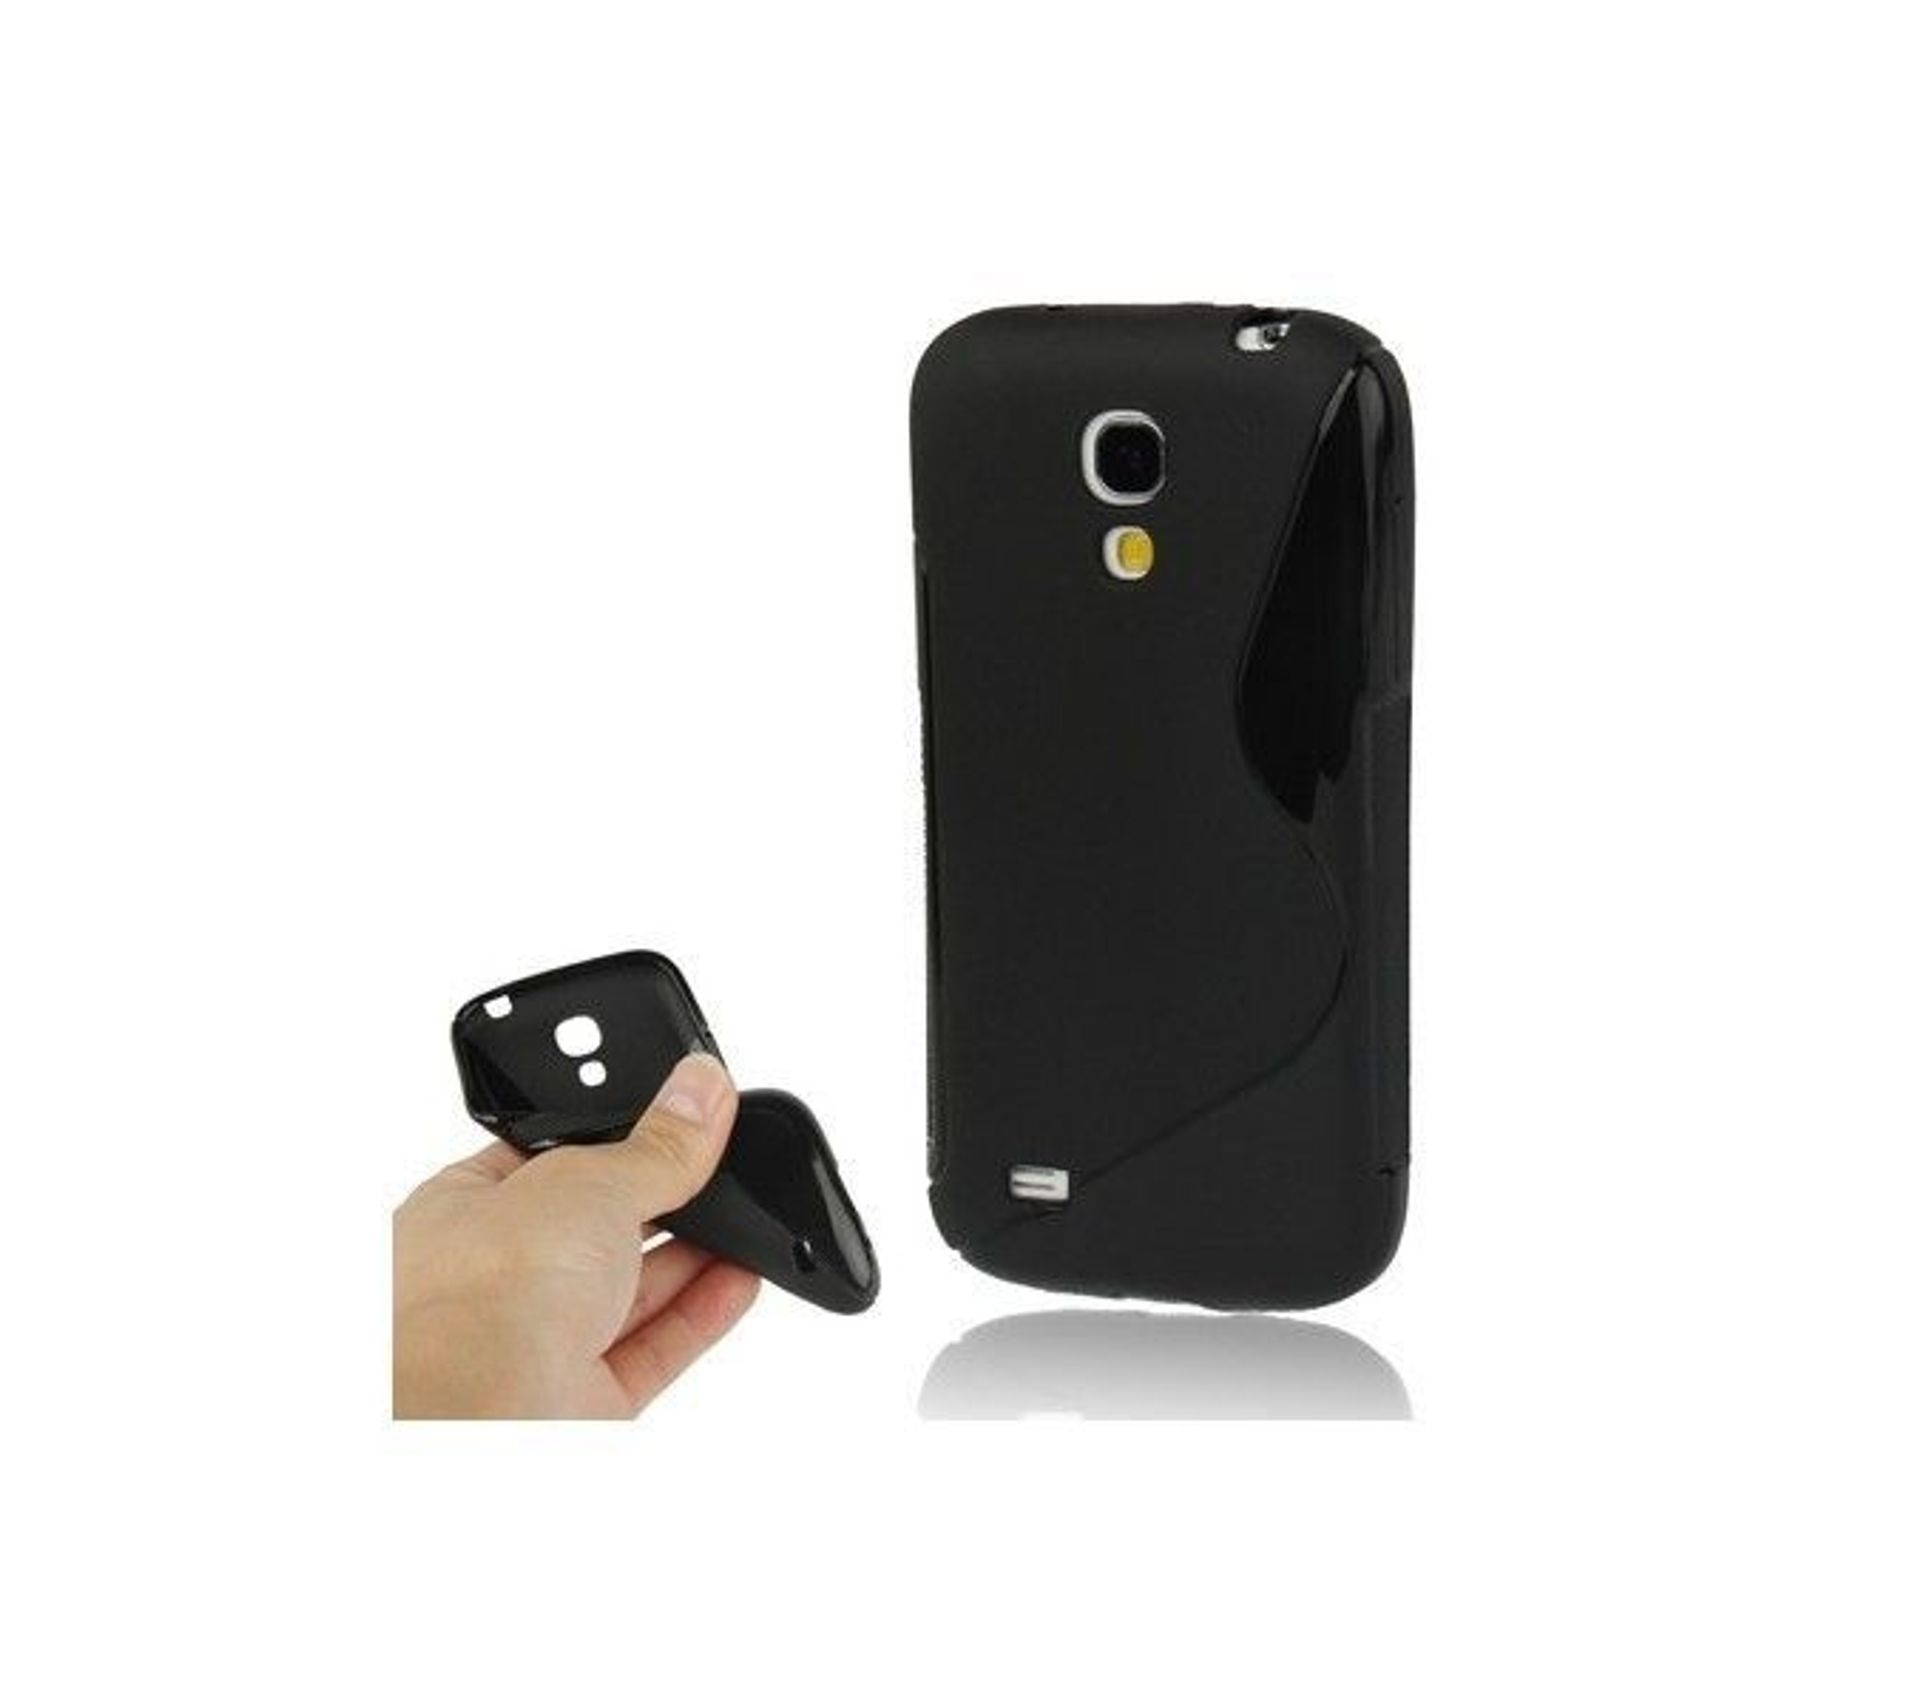 Coque Etui Silicone S-line Noir Pour Samsung S7390 Galaxy Trend Lite